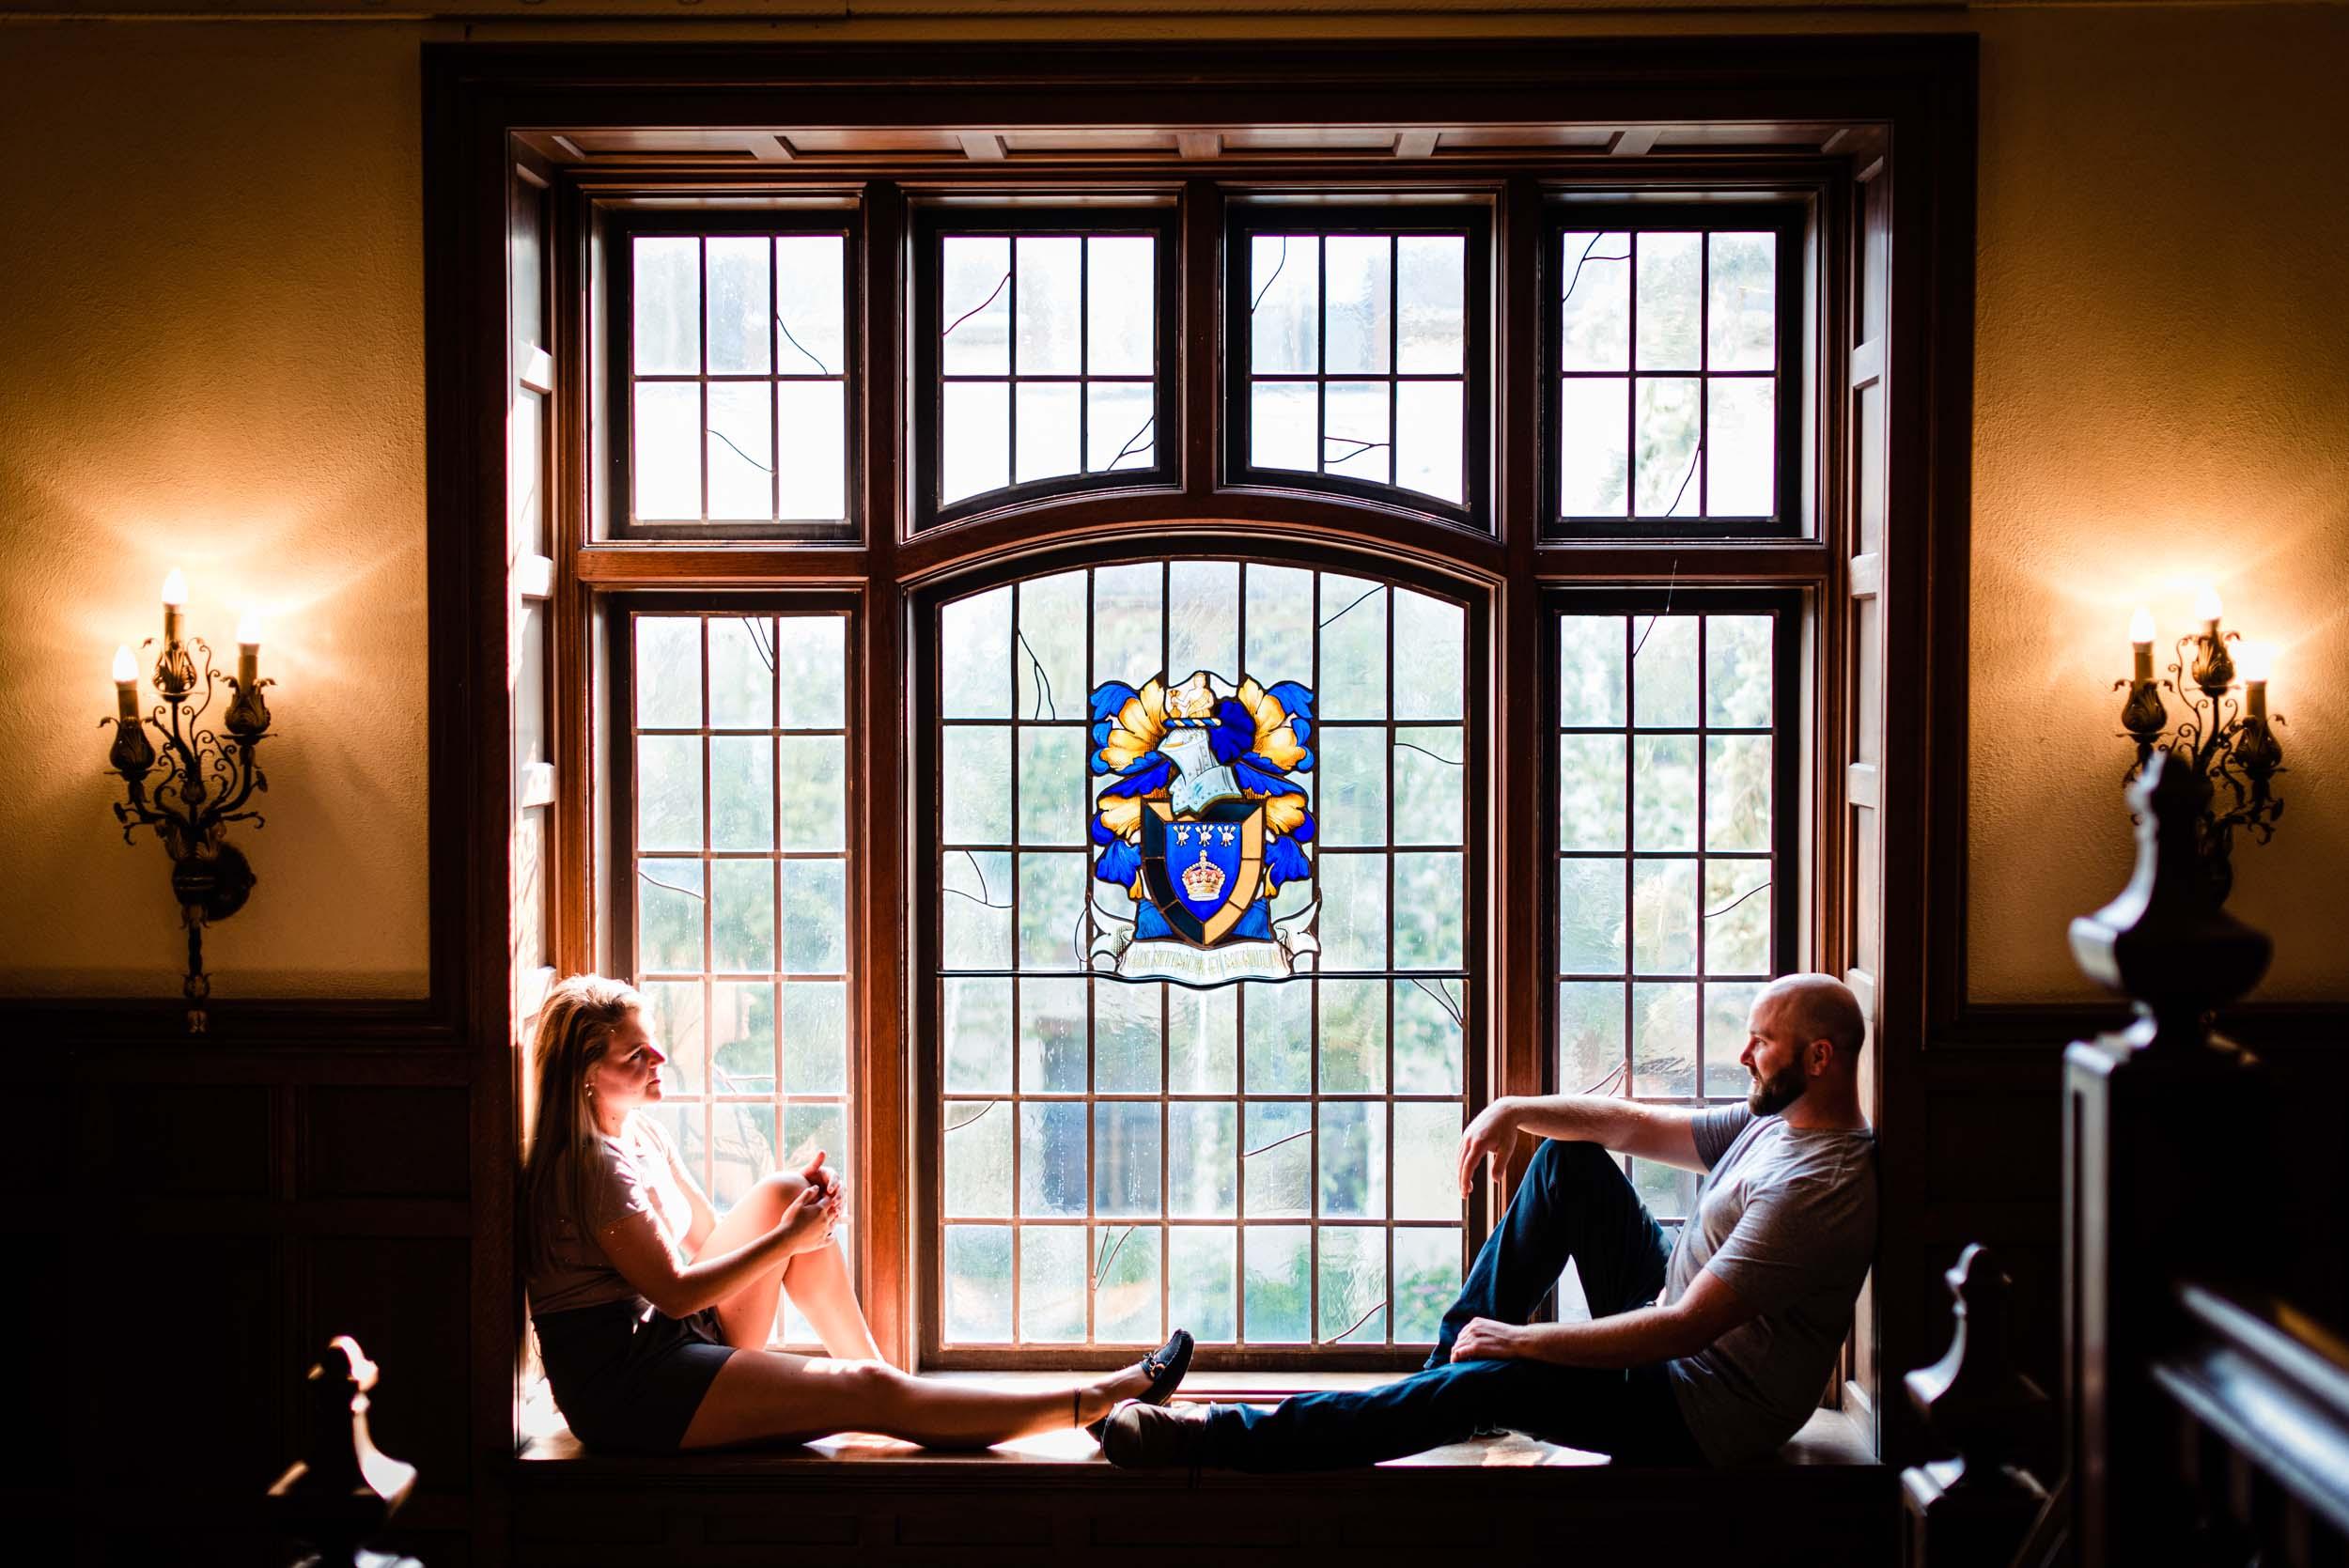 Engagement-Photography-King-College-London-Ontario (6).jpg